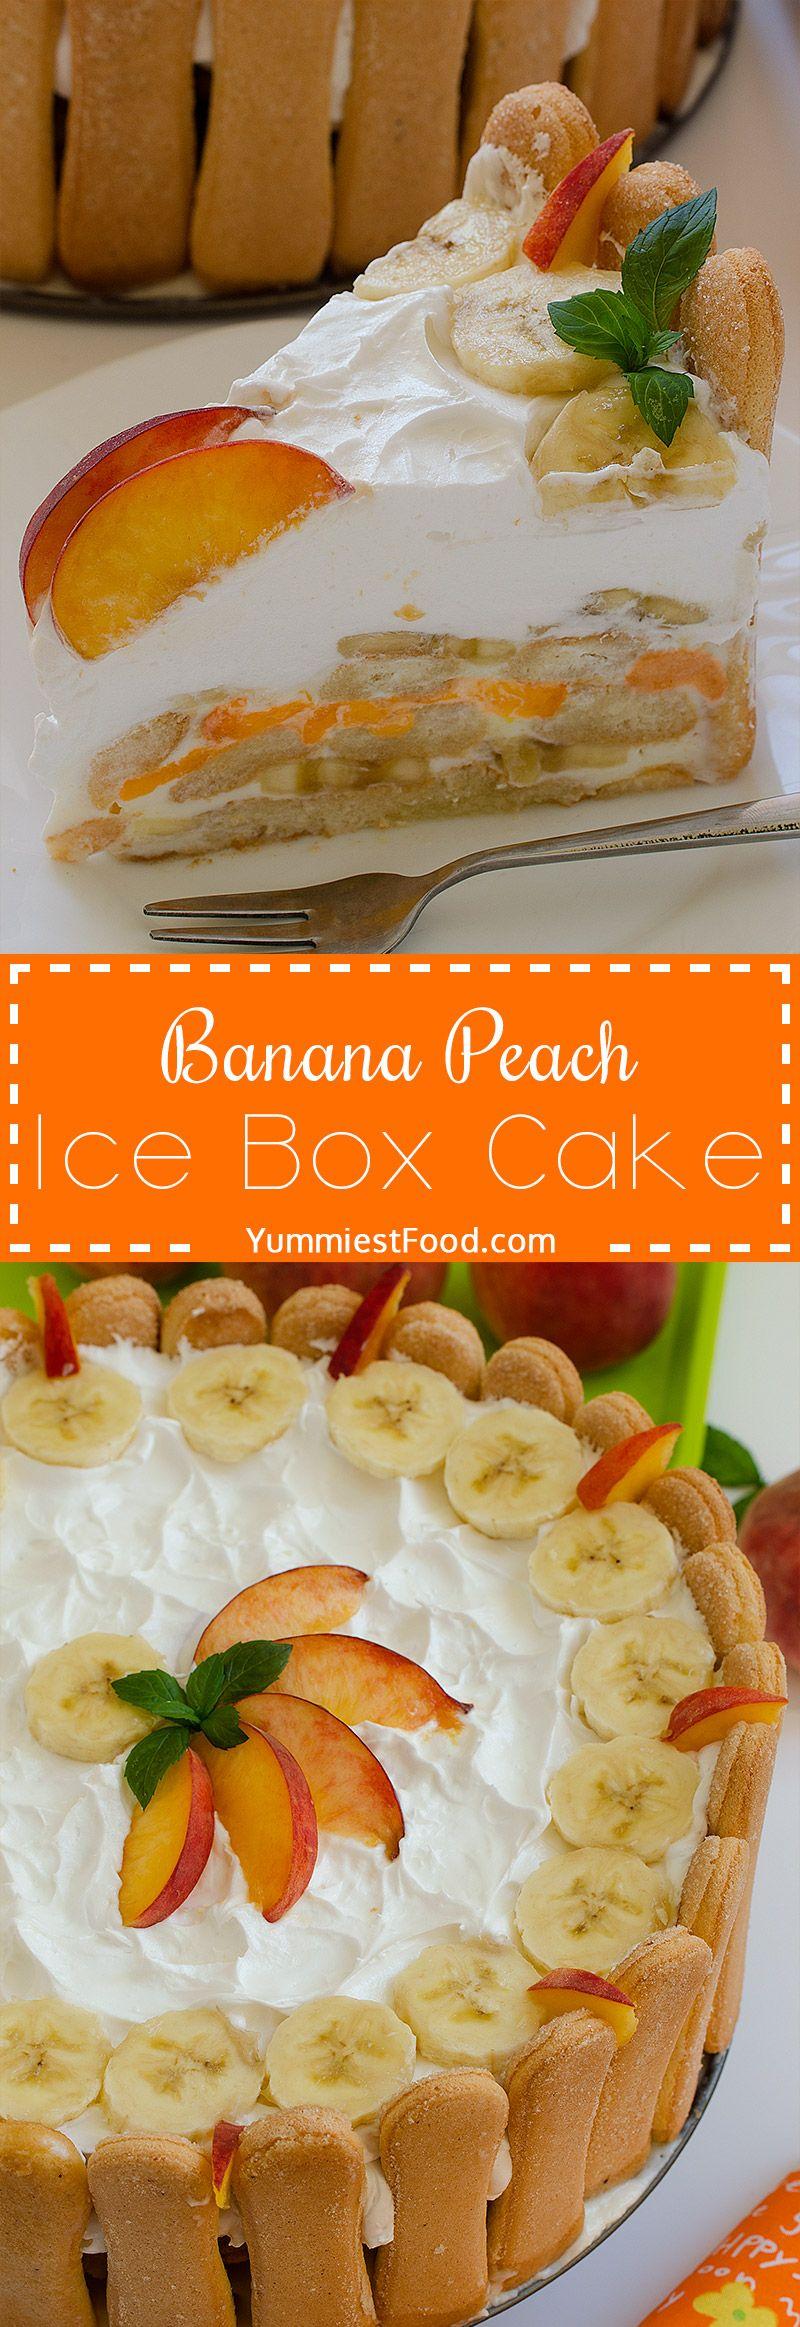 banana peach ice box cake recipe icebox cake peach banana box cake pinterest